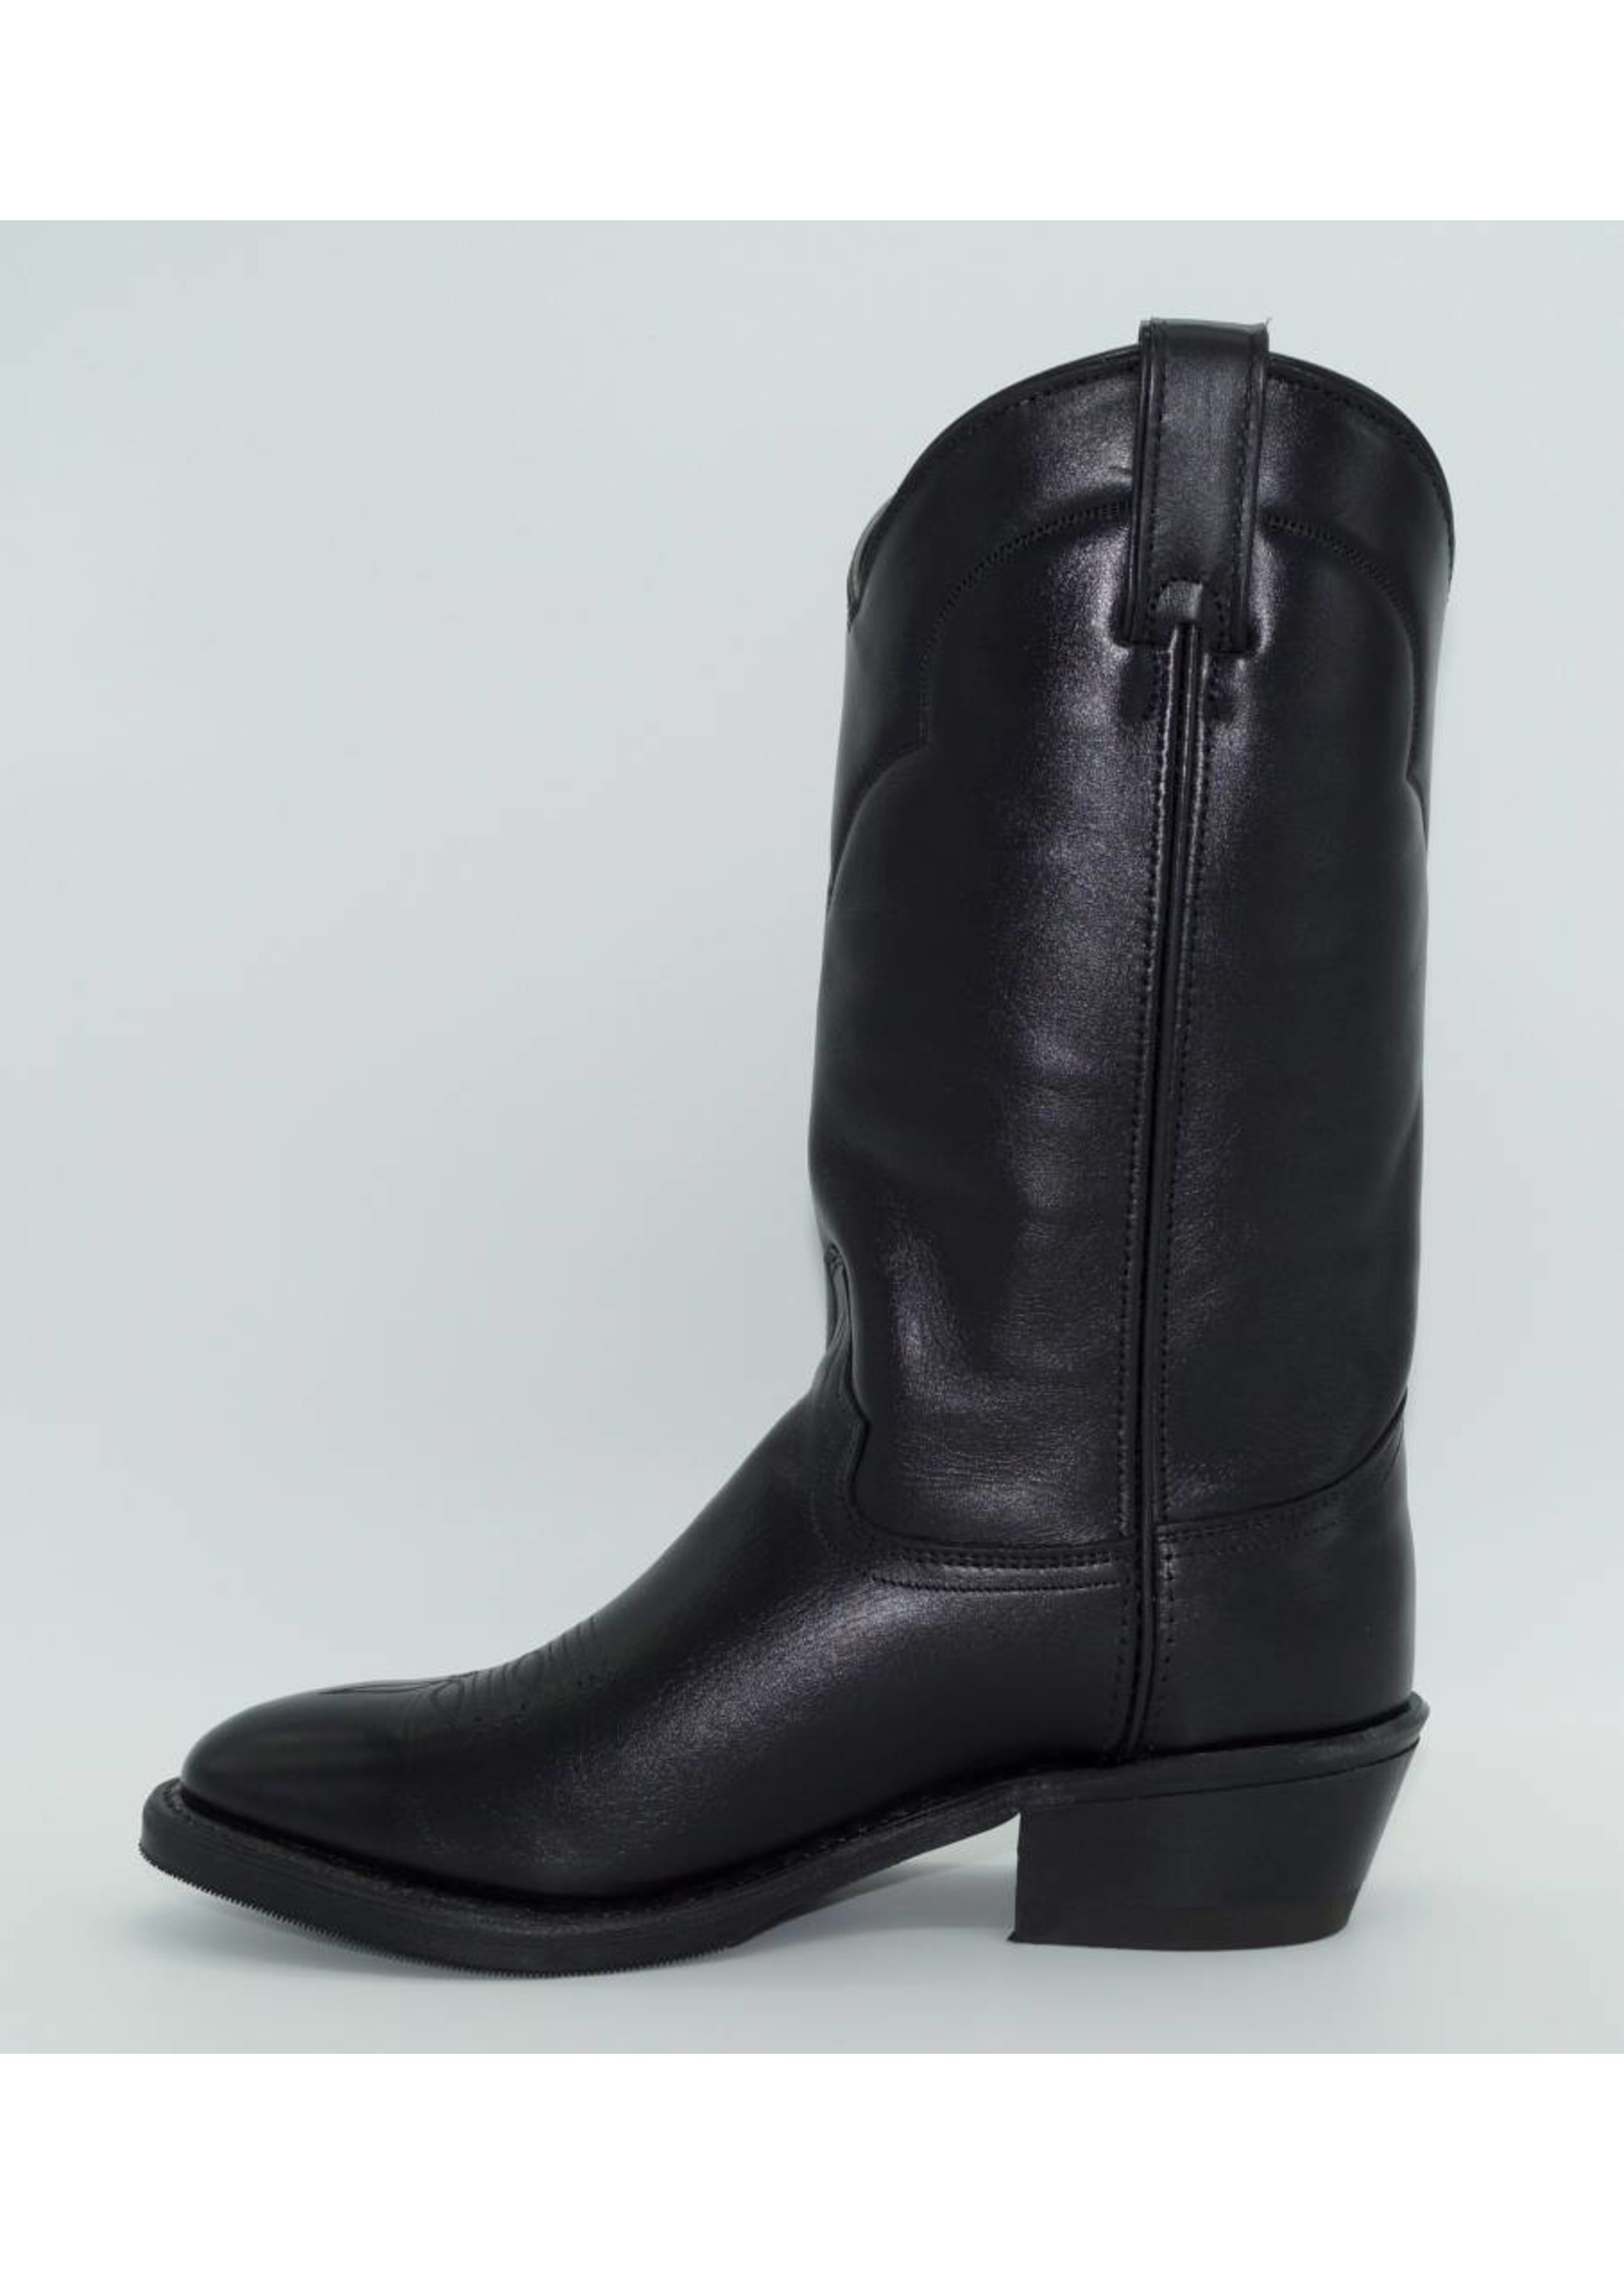 Abilene Abilene Men's Polished Cowhide Boot 6401